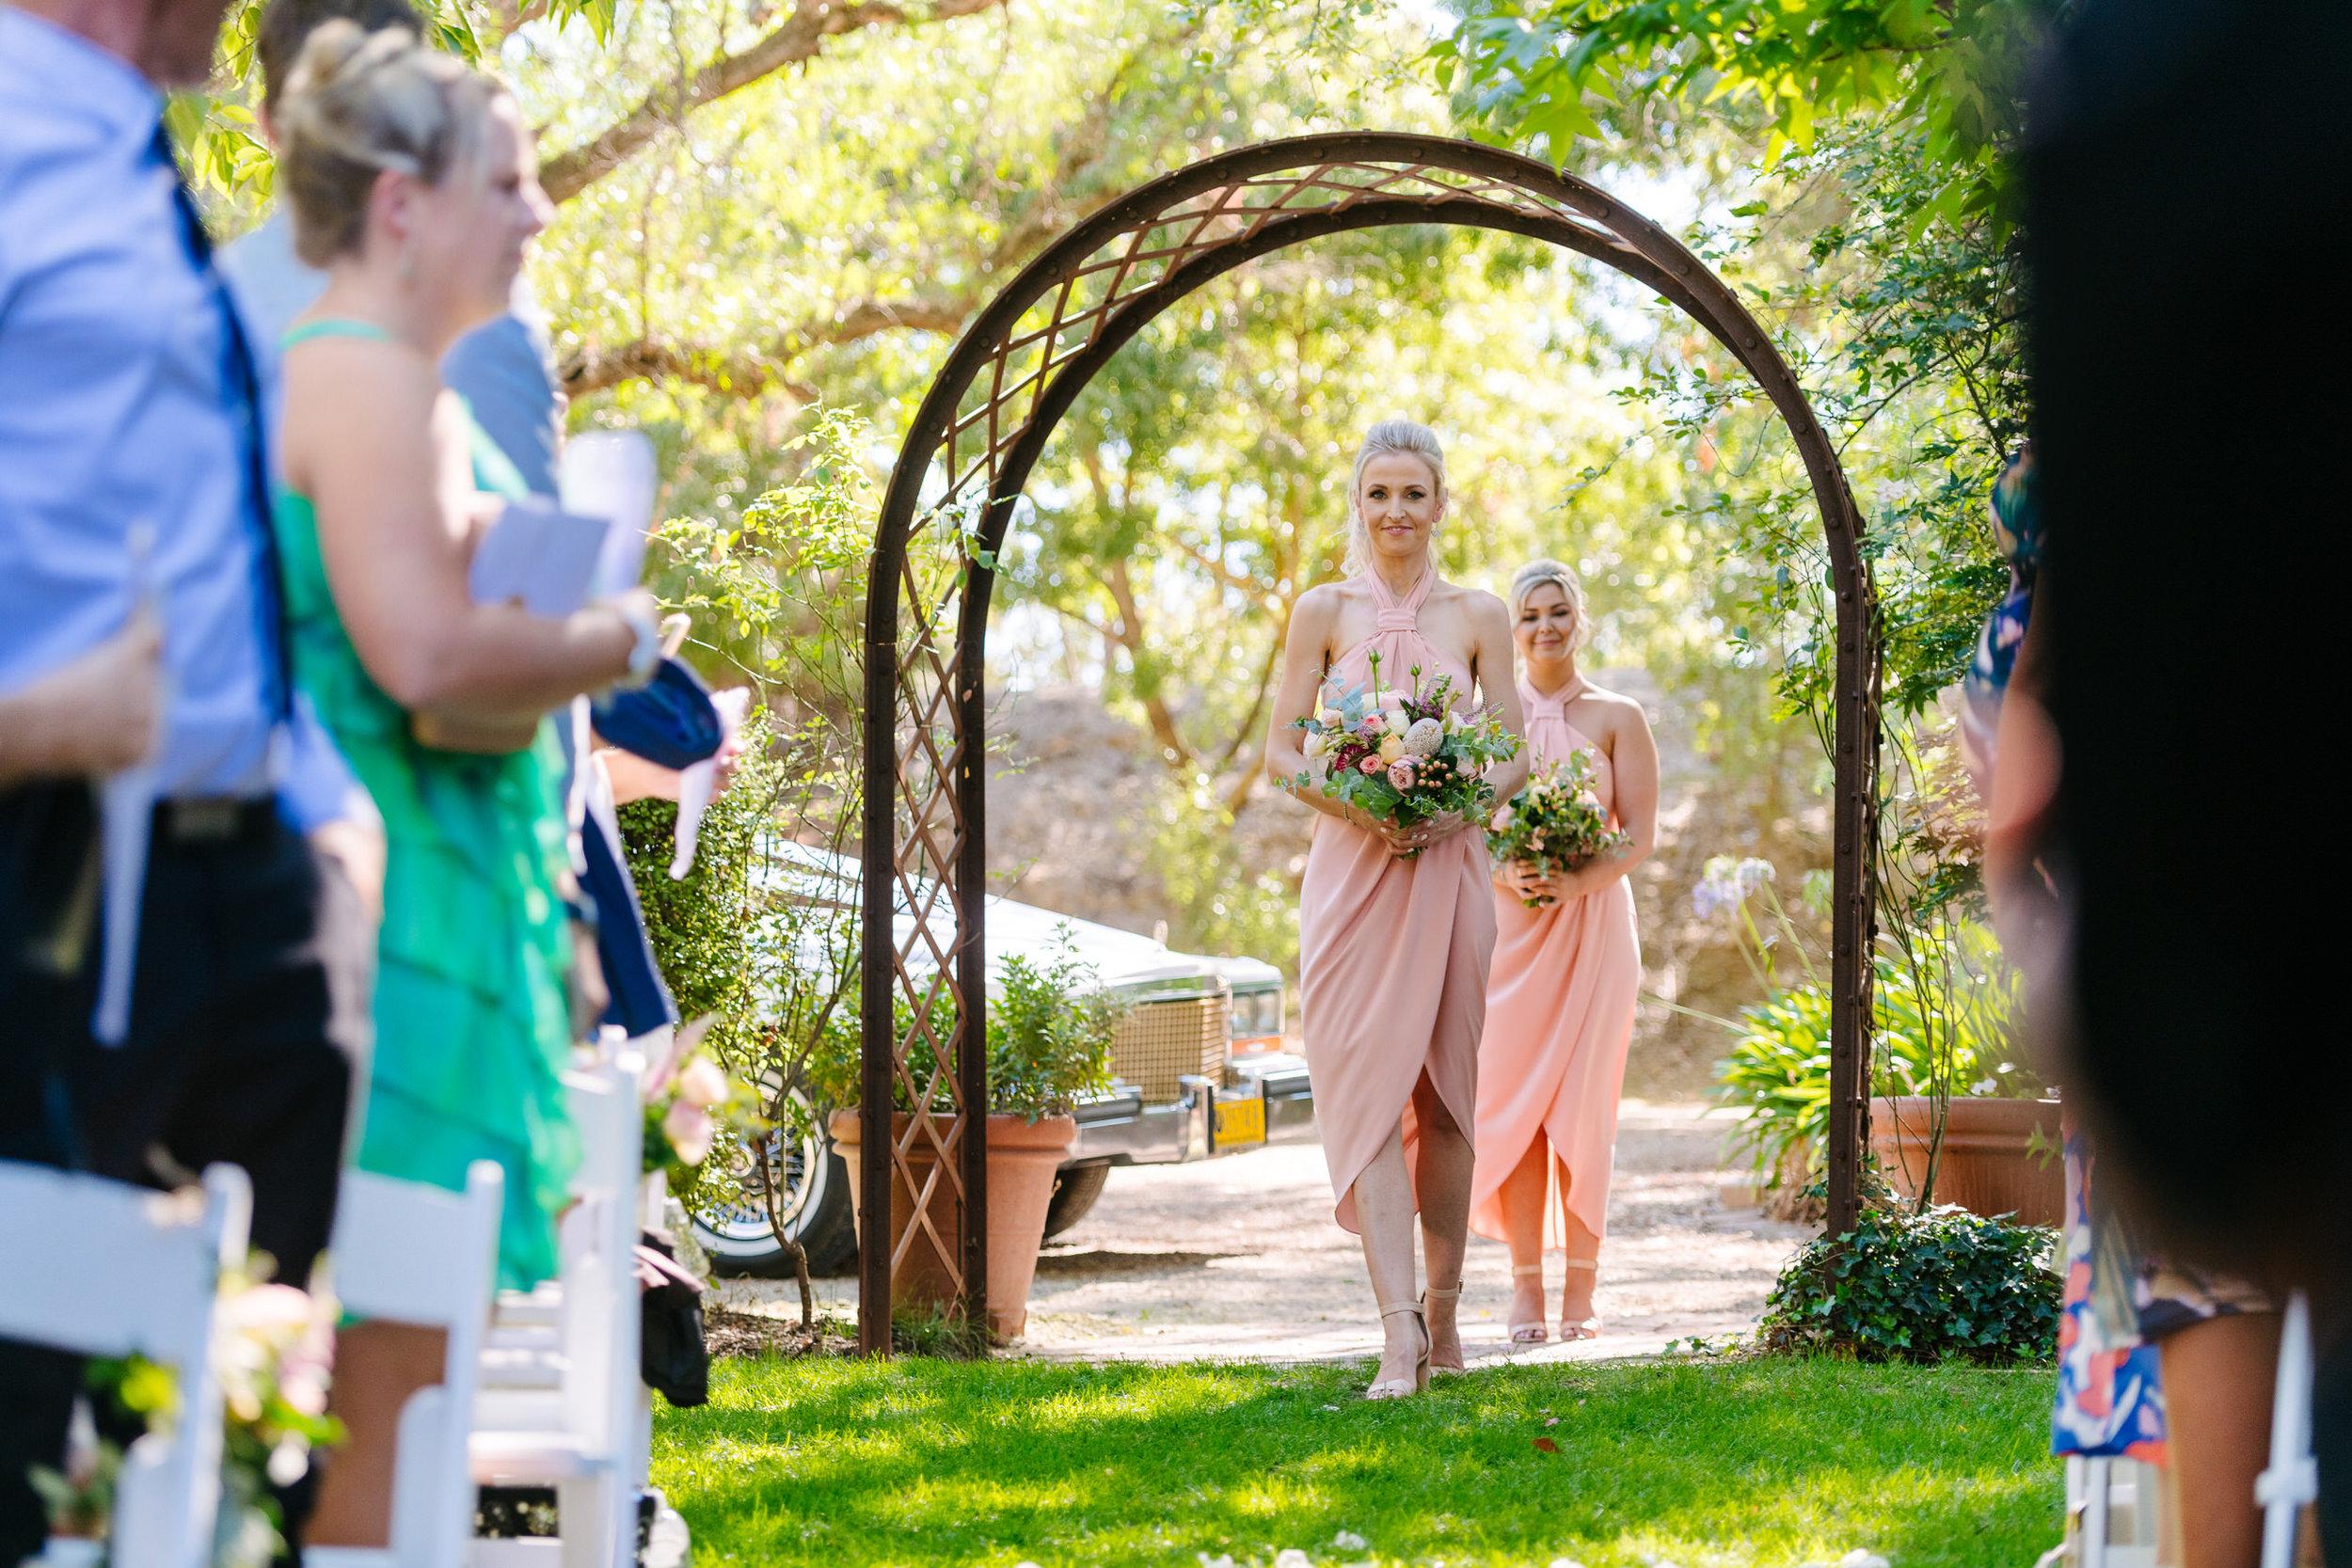 Justin_And_Jim_Photography_Chateau_Dore_Bendigo_Wedding27.JPG